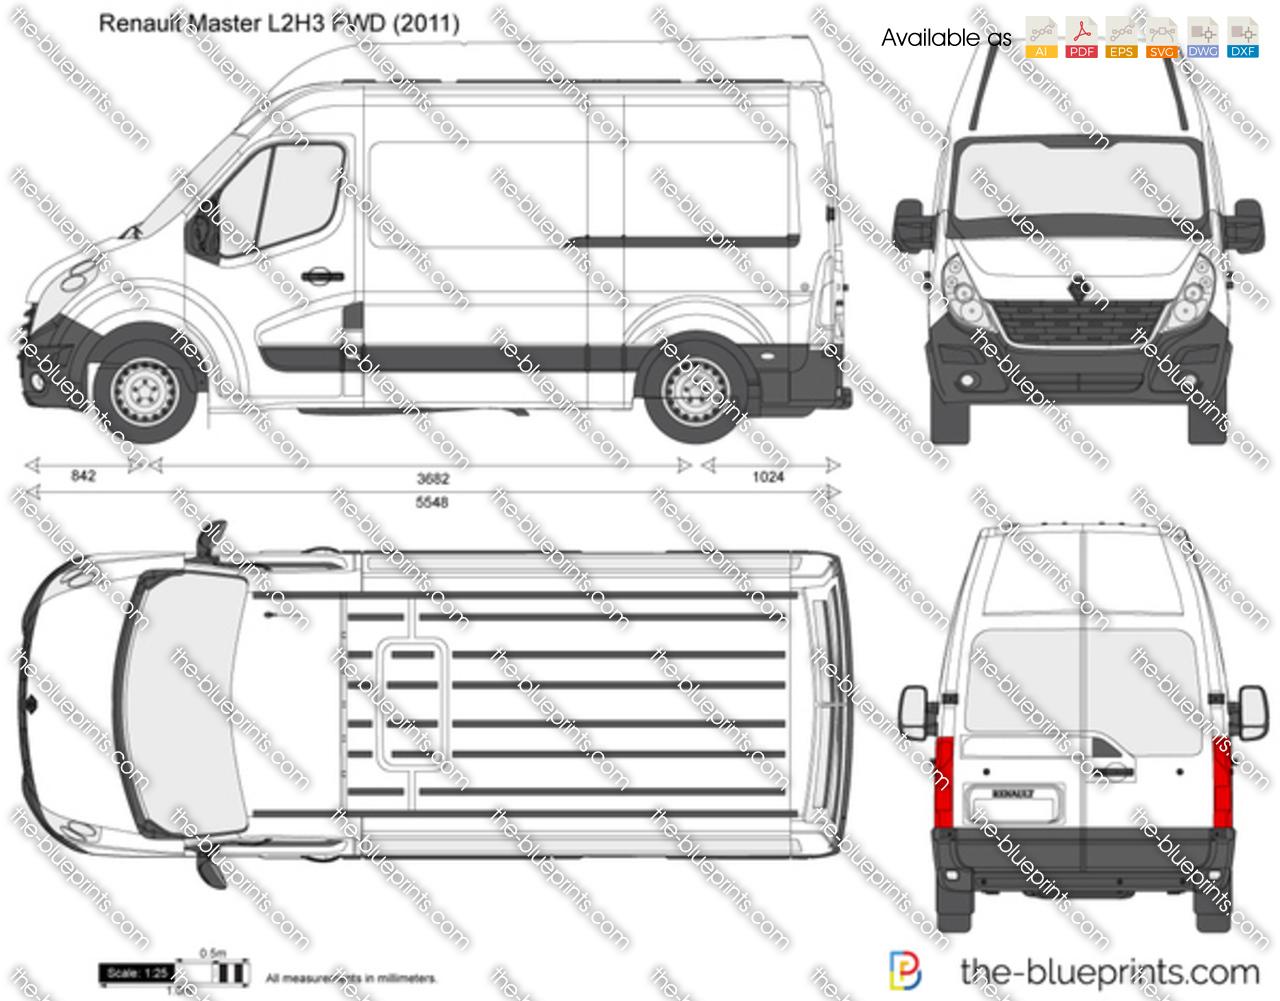 the vector drawing renault master l2h3 fwd. Black Bedroom Furniture Sets. Home Design Ideas